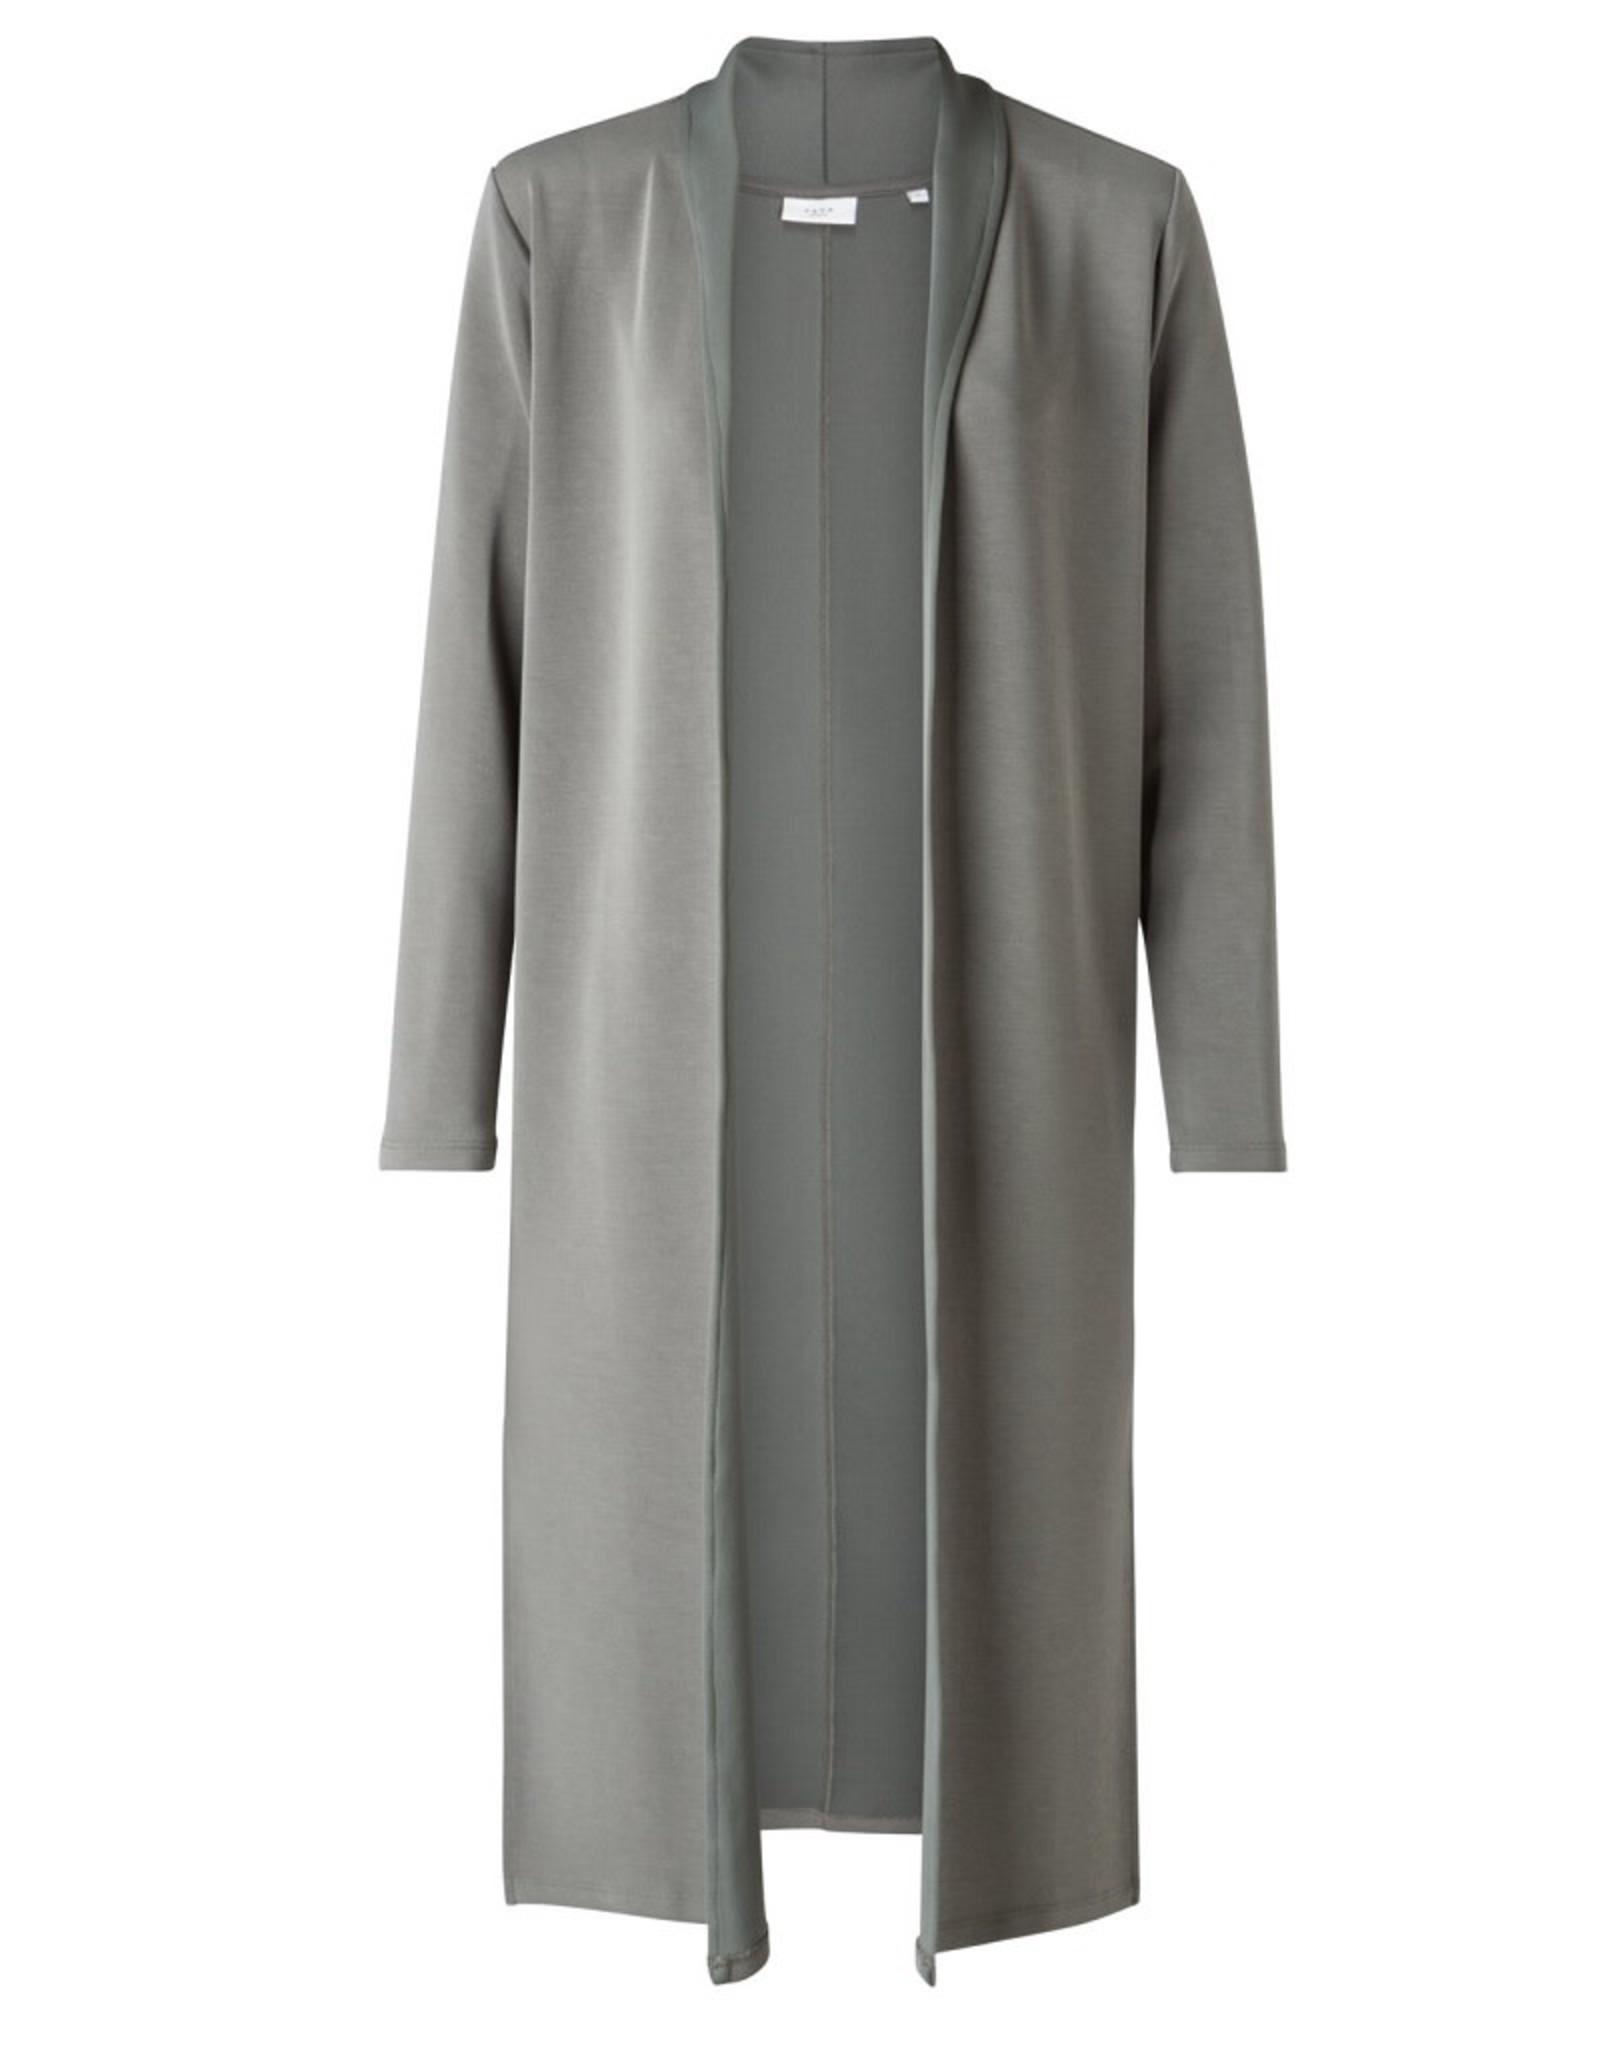 Yaya YAYA vest Blueish grey